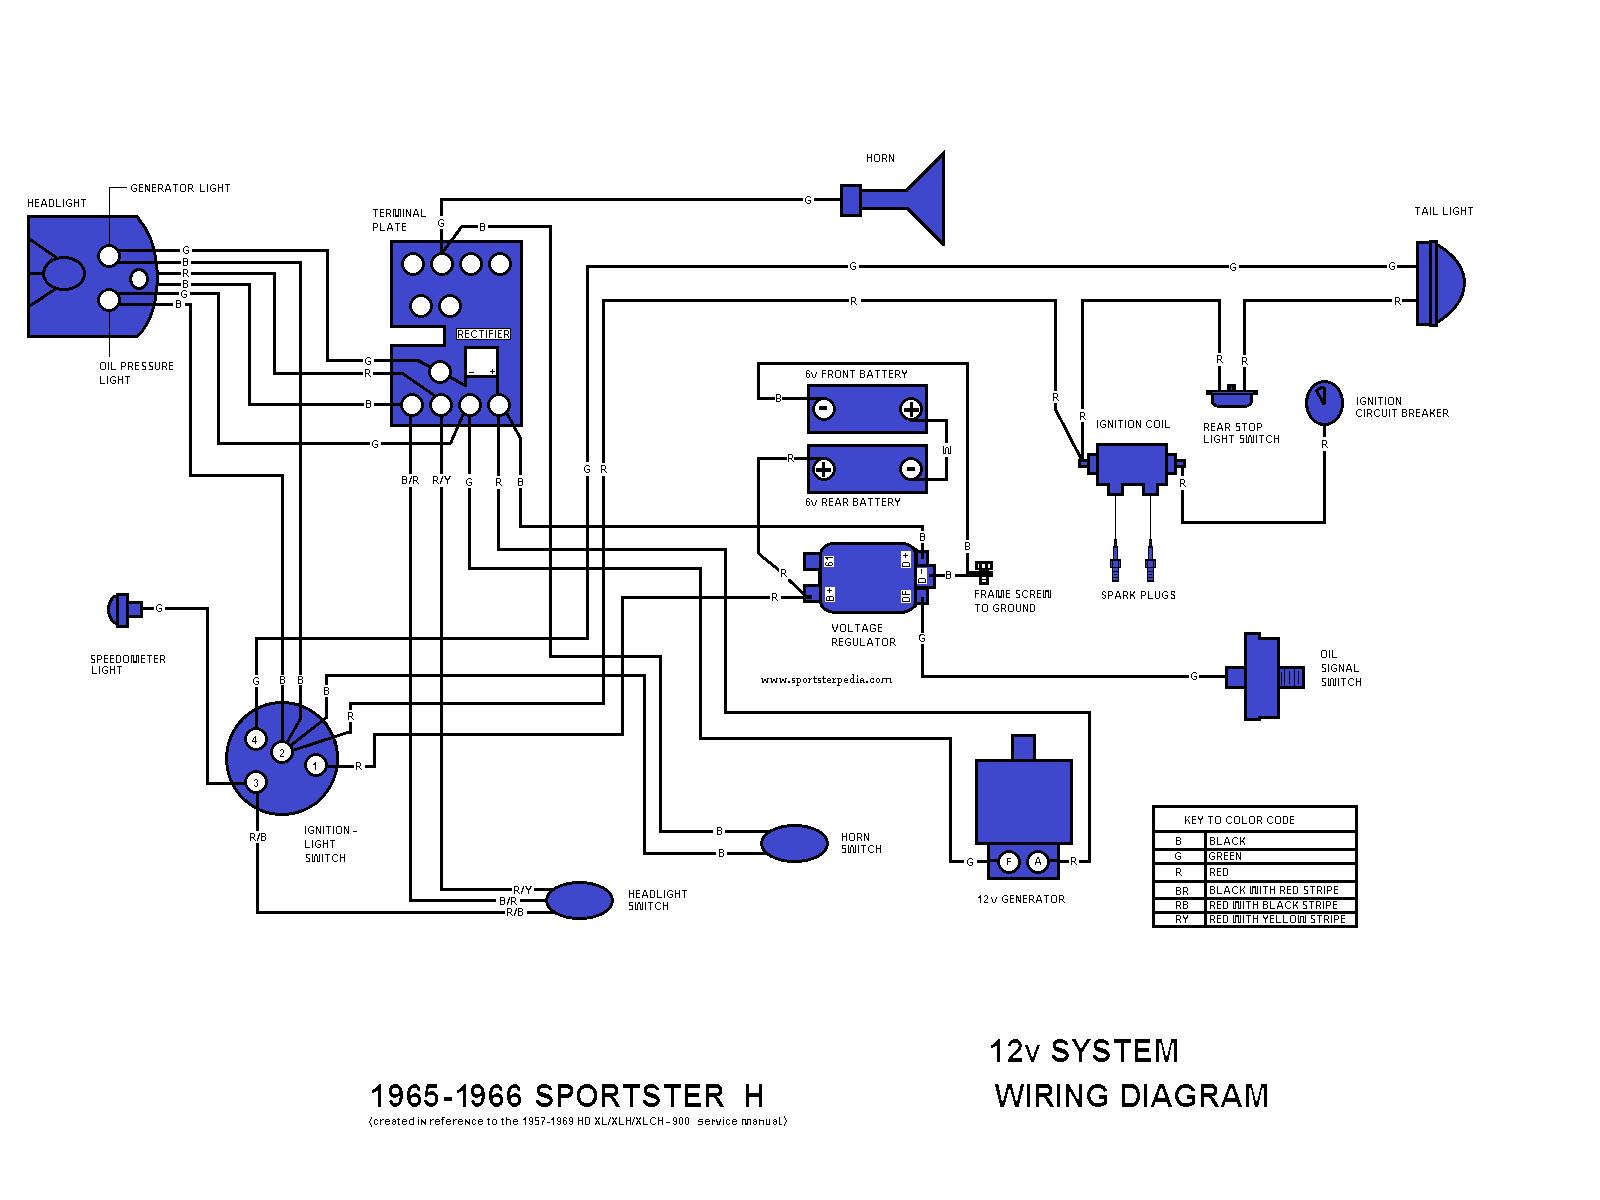 [ZHKZ_3066]  REF: Electrical System - Sportsterpedia | 1983 Sportster Wiring Diagram |  | Sportsterpedia